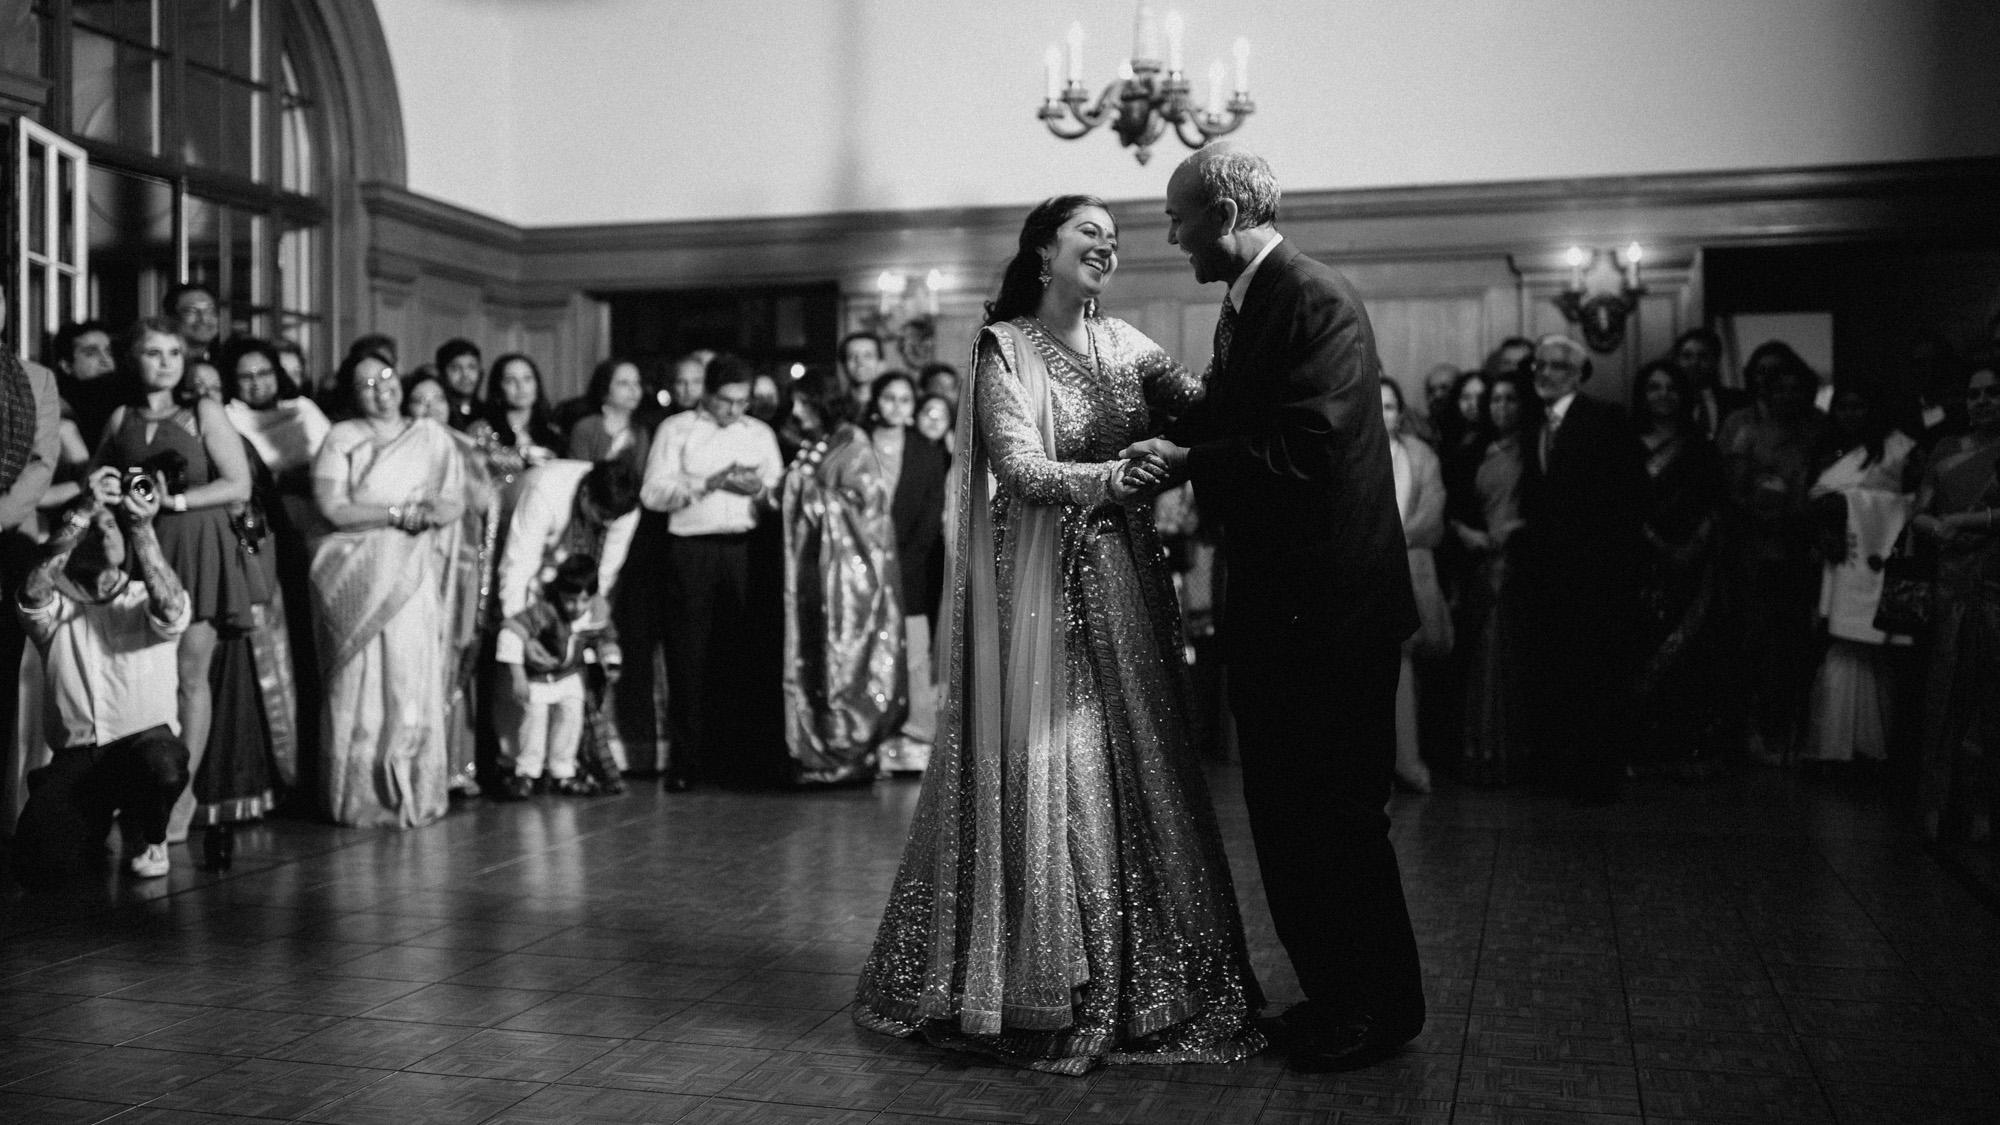 anu_maneesh_alec_vanderboom_Indian_wedding_photography-0169.jpg